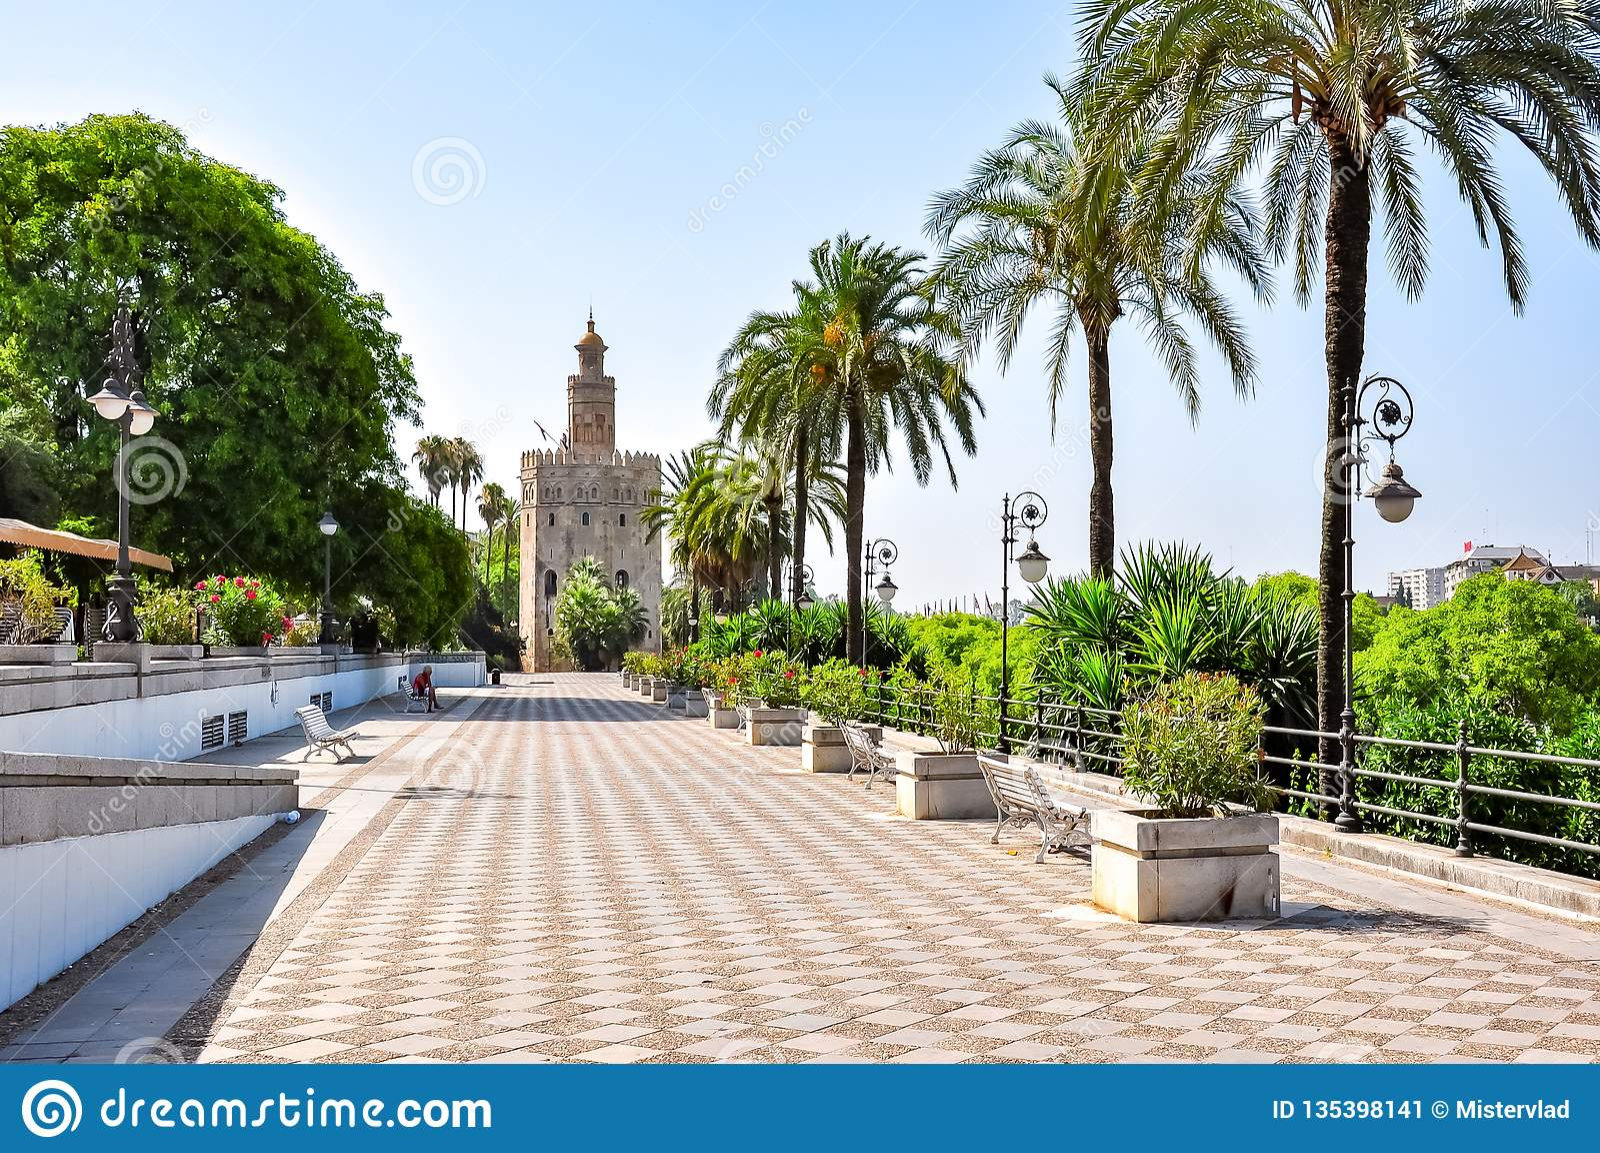 Севилья embanmkent и башня Золота Torre del Oro, Испании